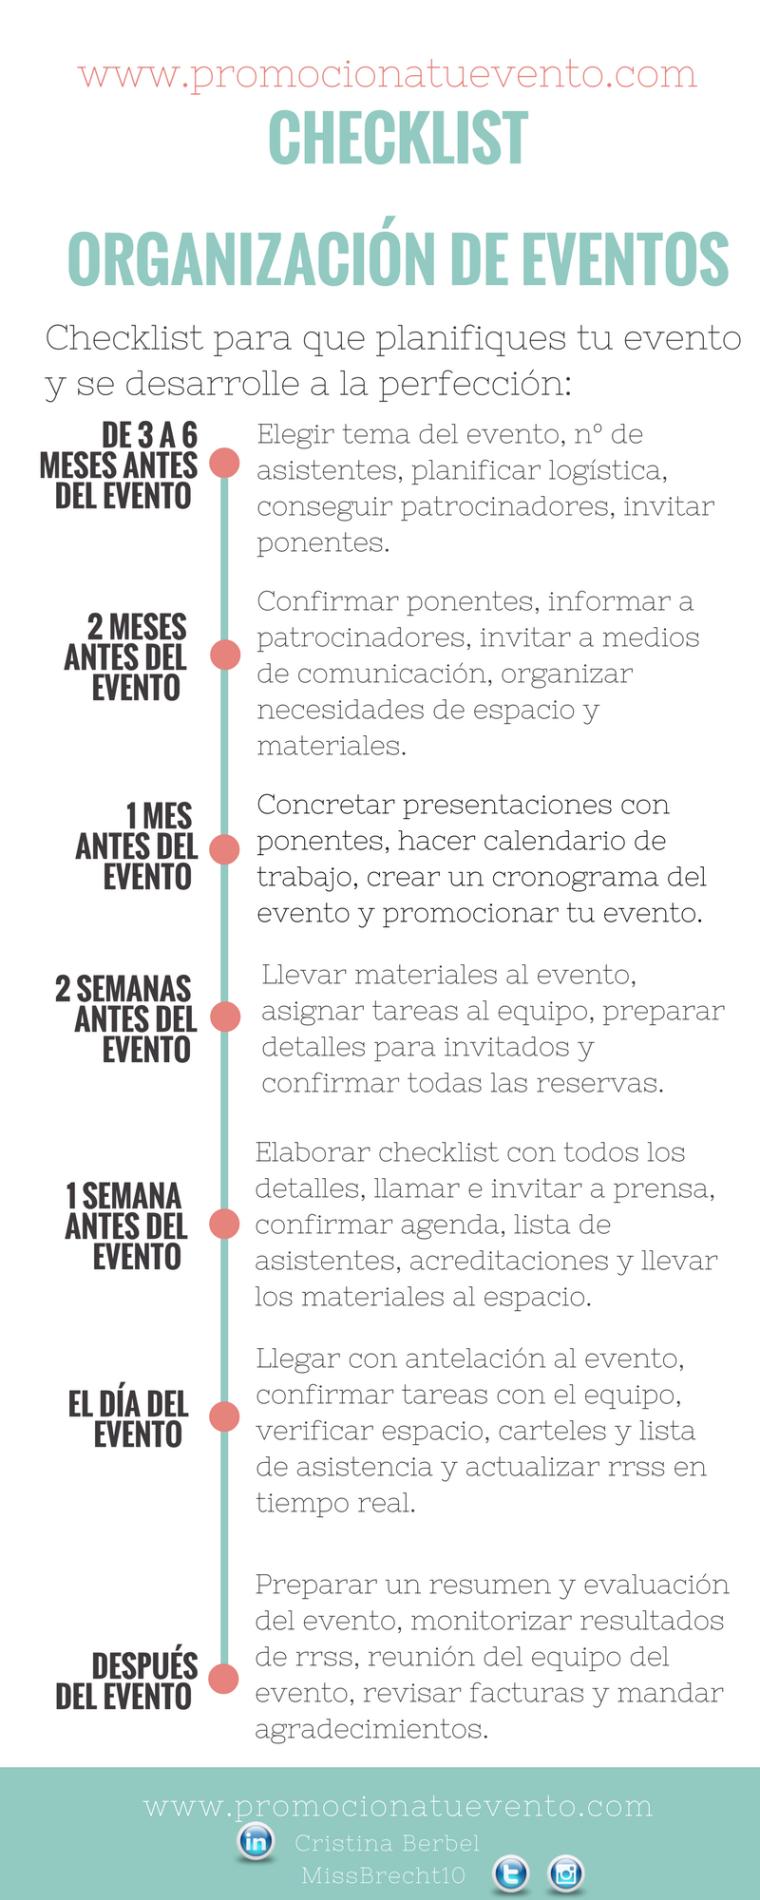 Checklist para organizar eventos